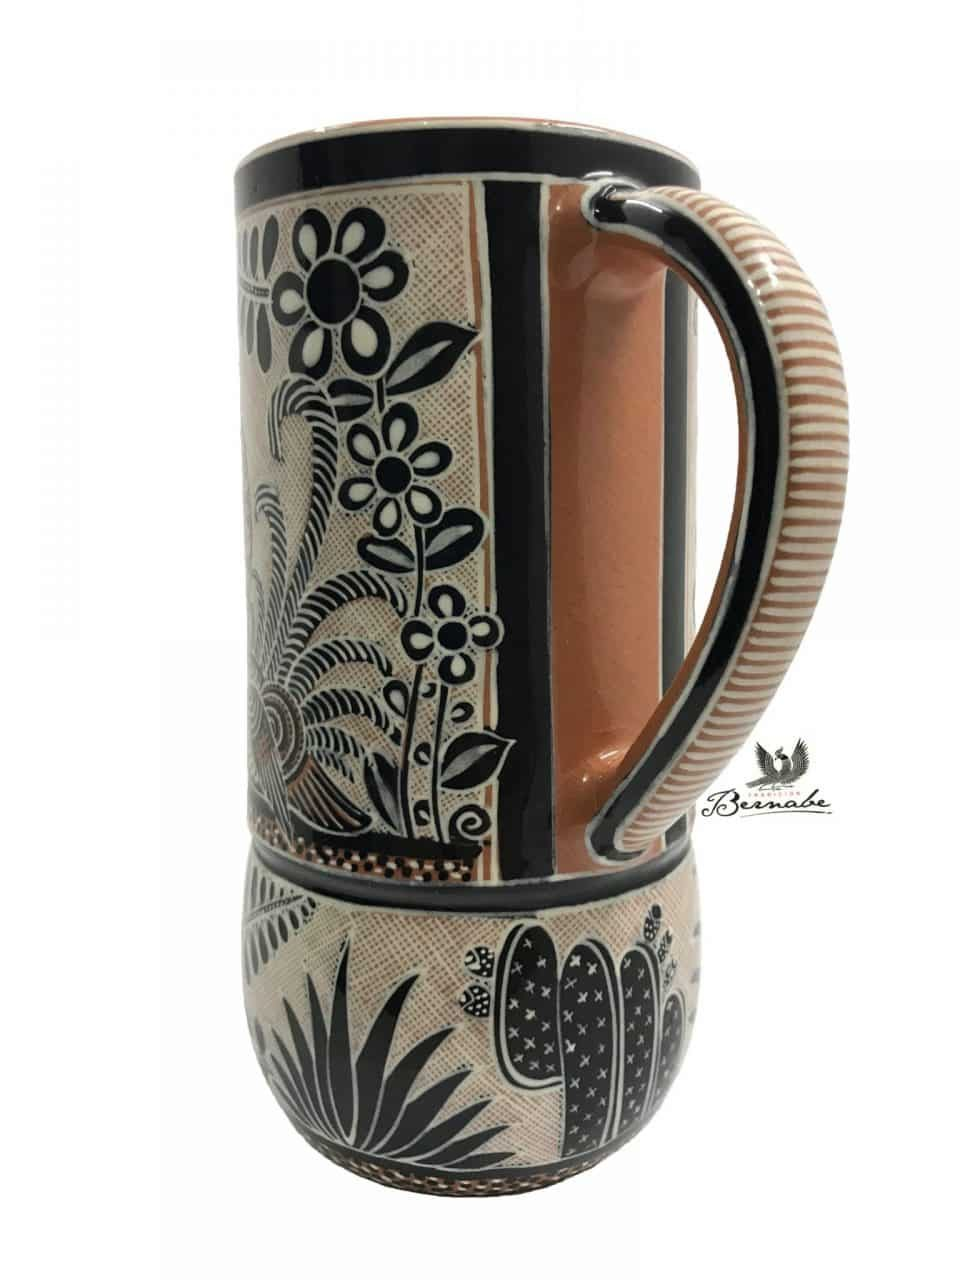 Mug (Petatillo Pottery) (9)